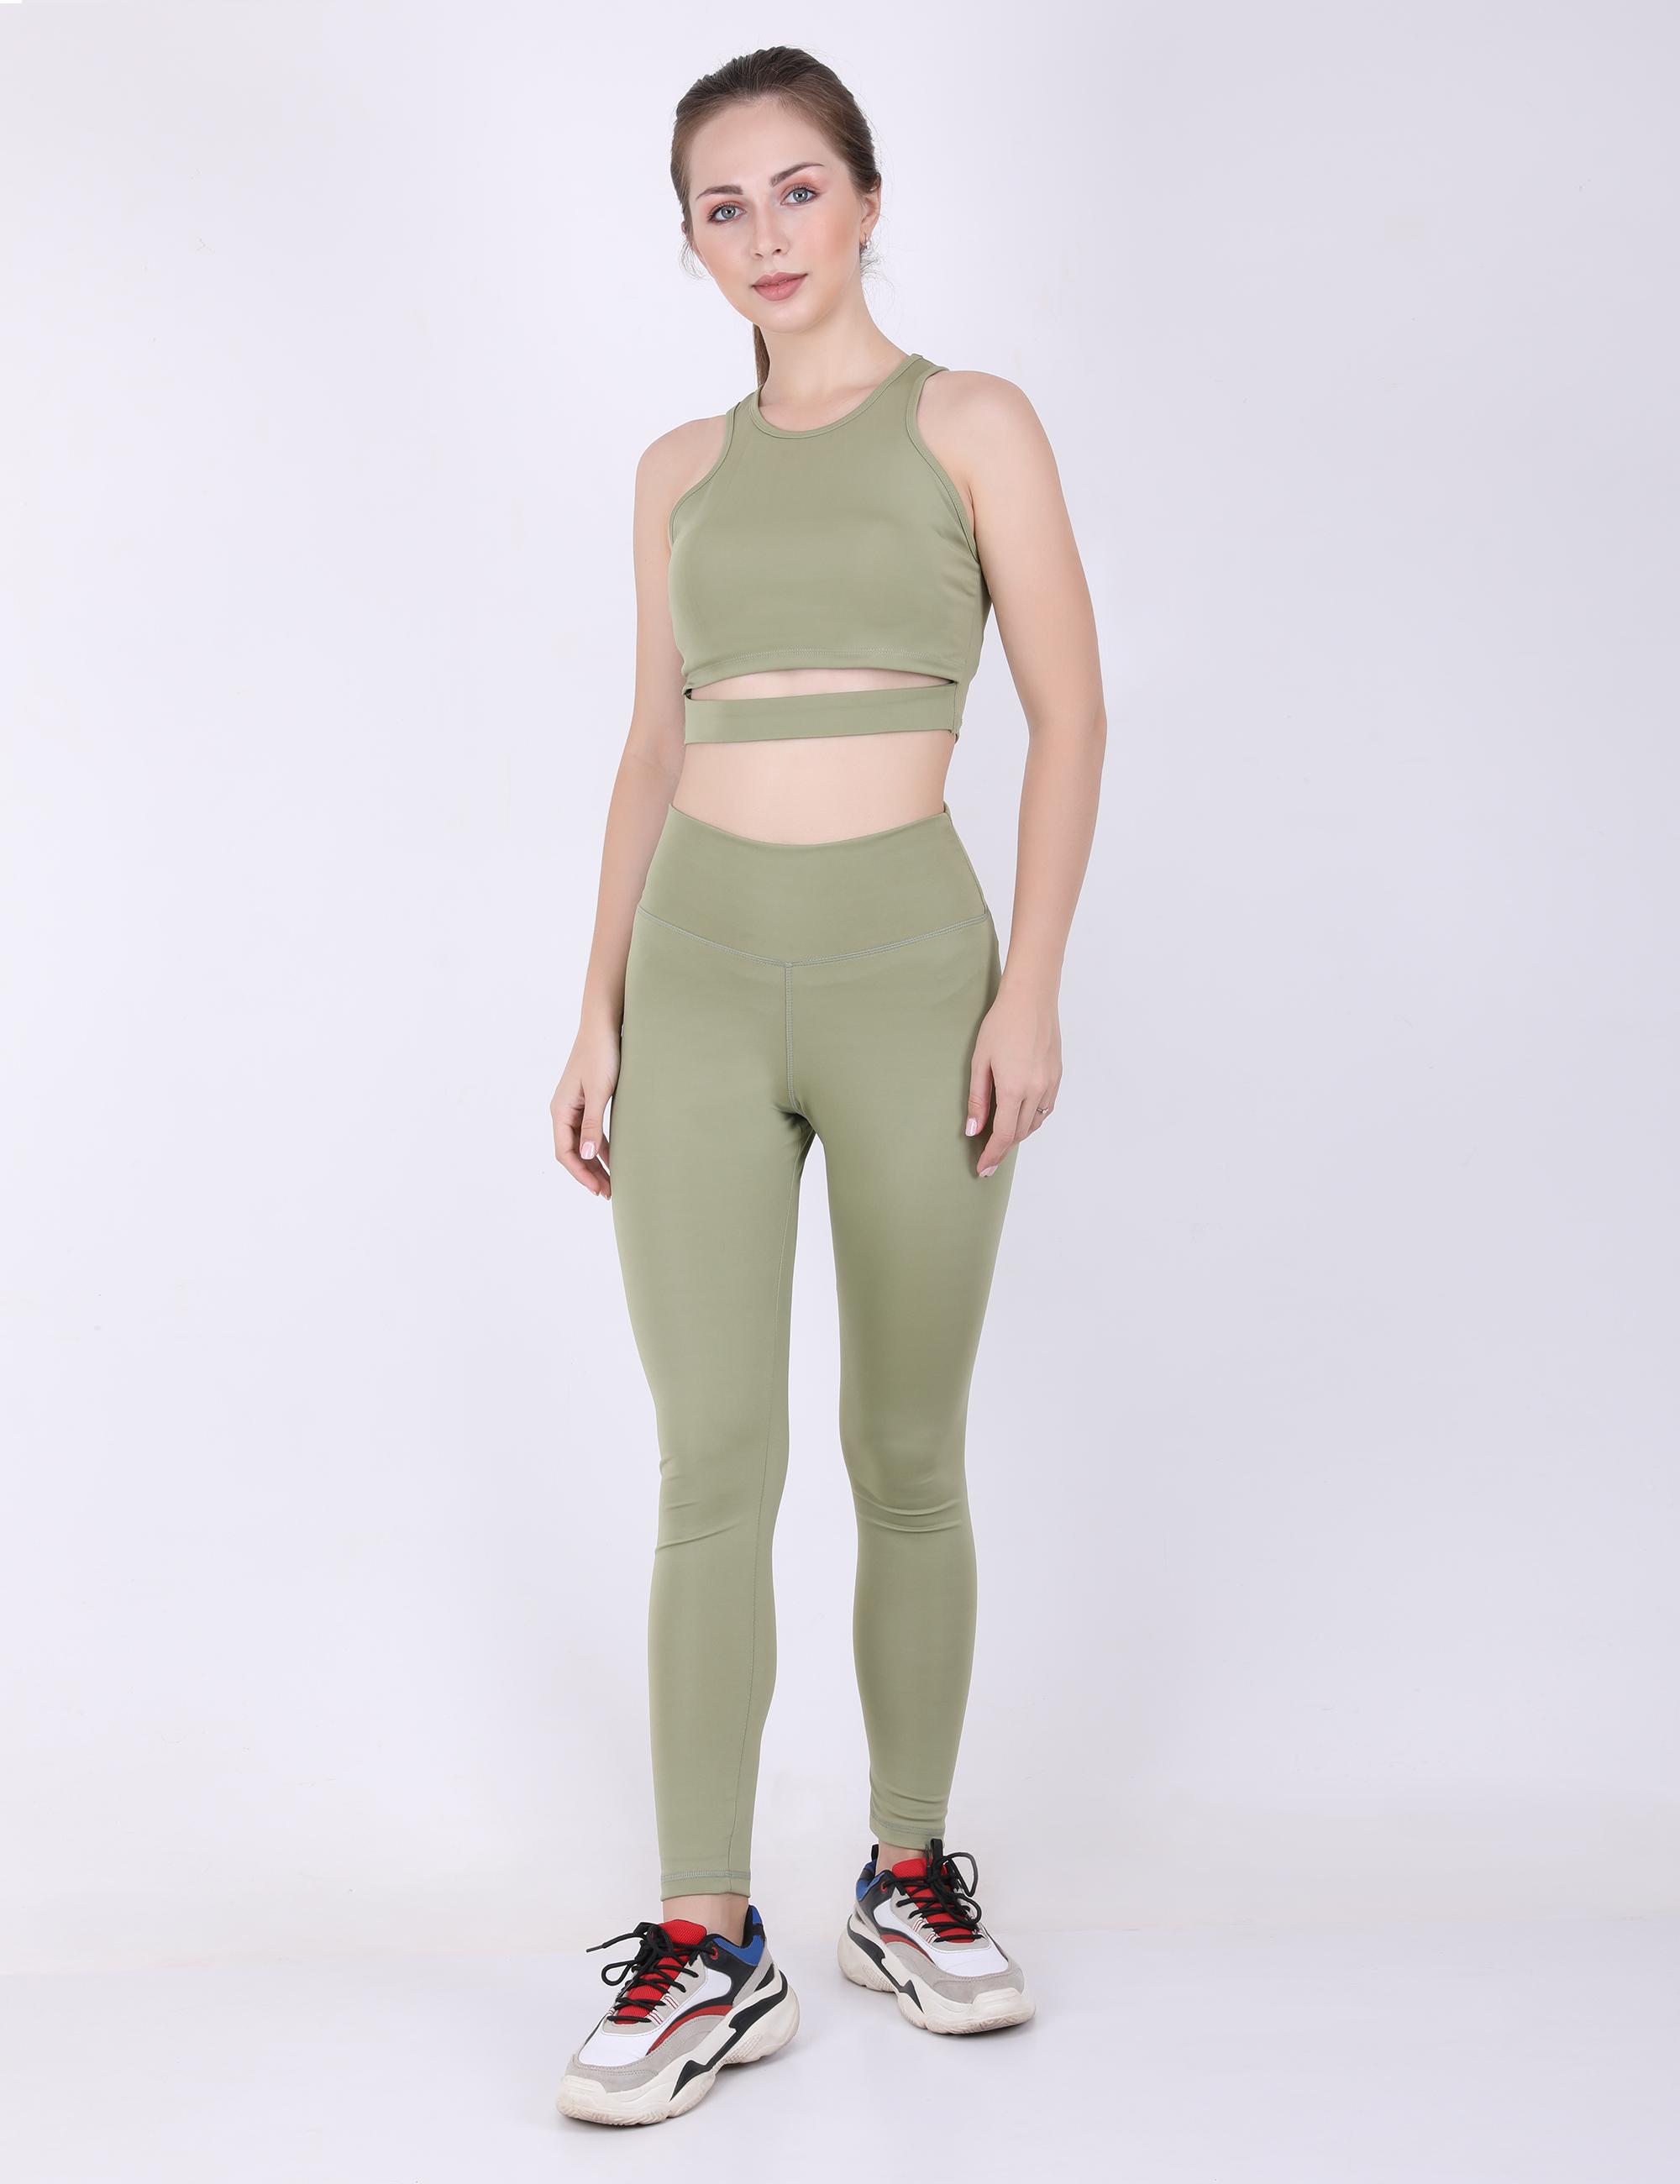 EVERDION | Green Workout Tank